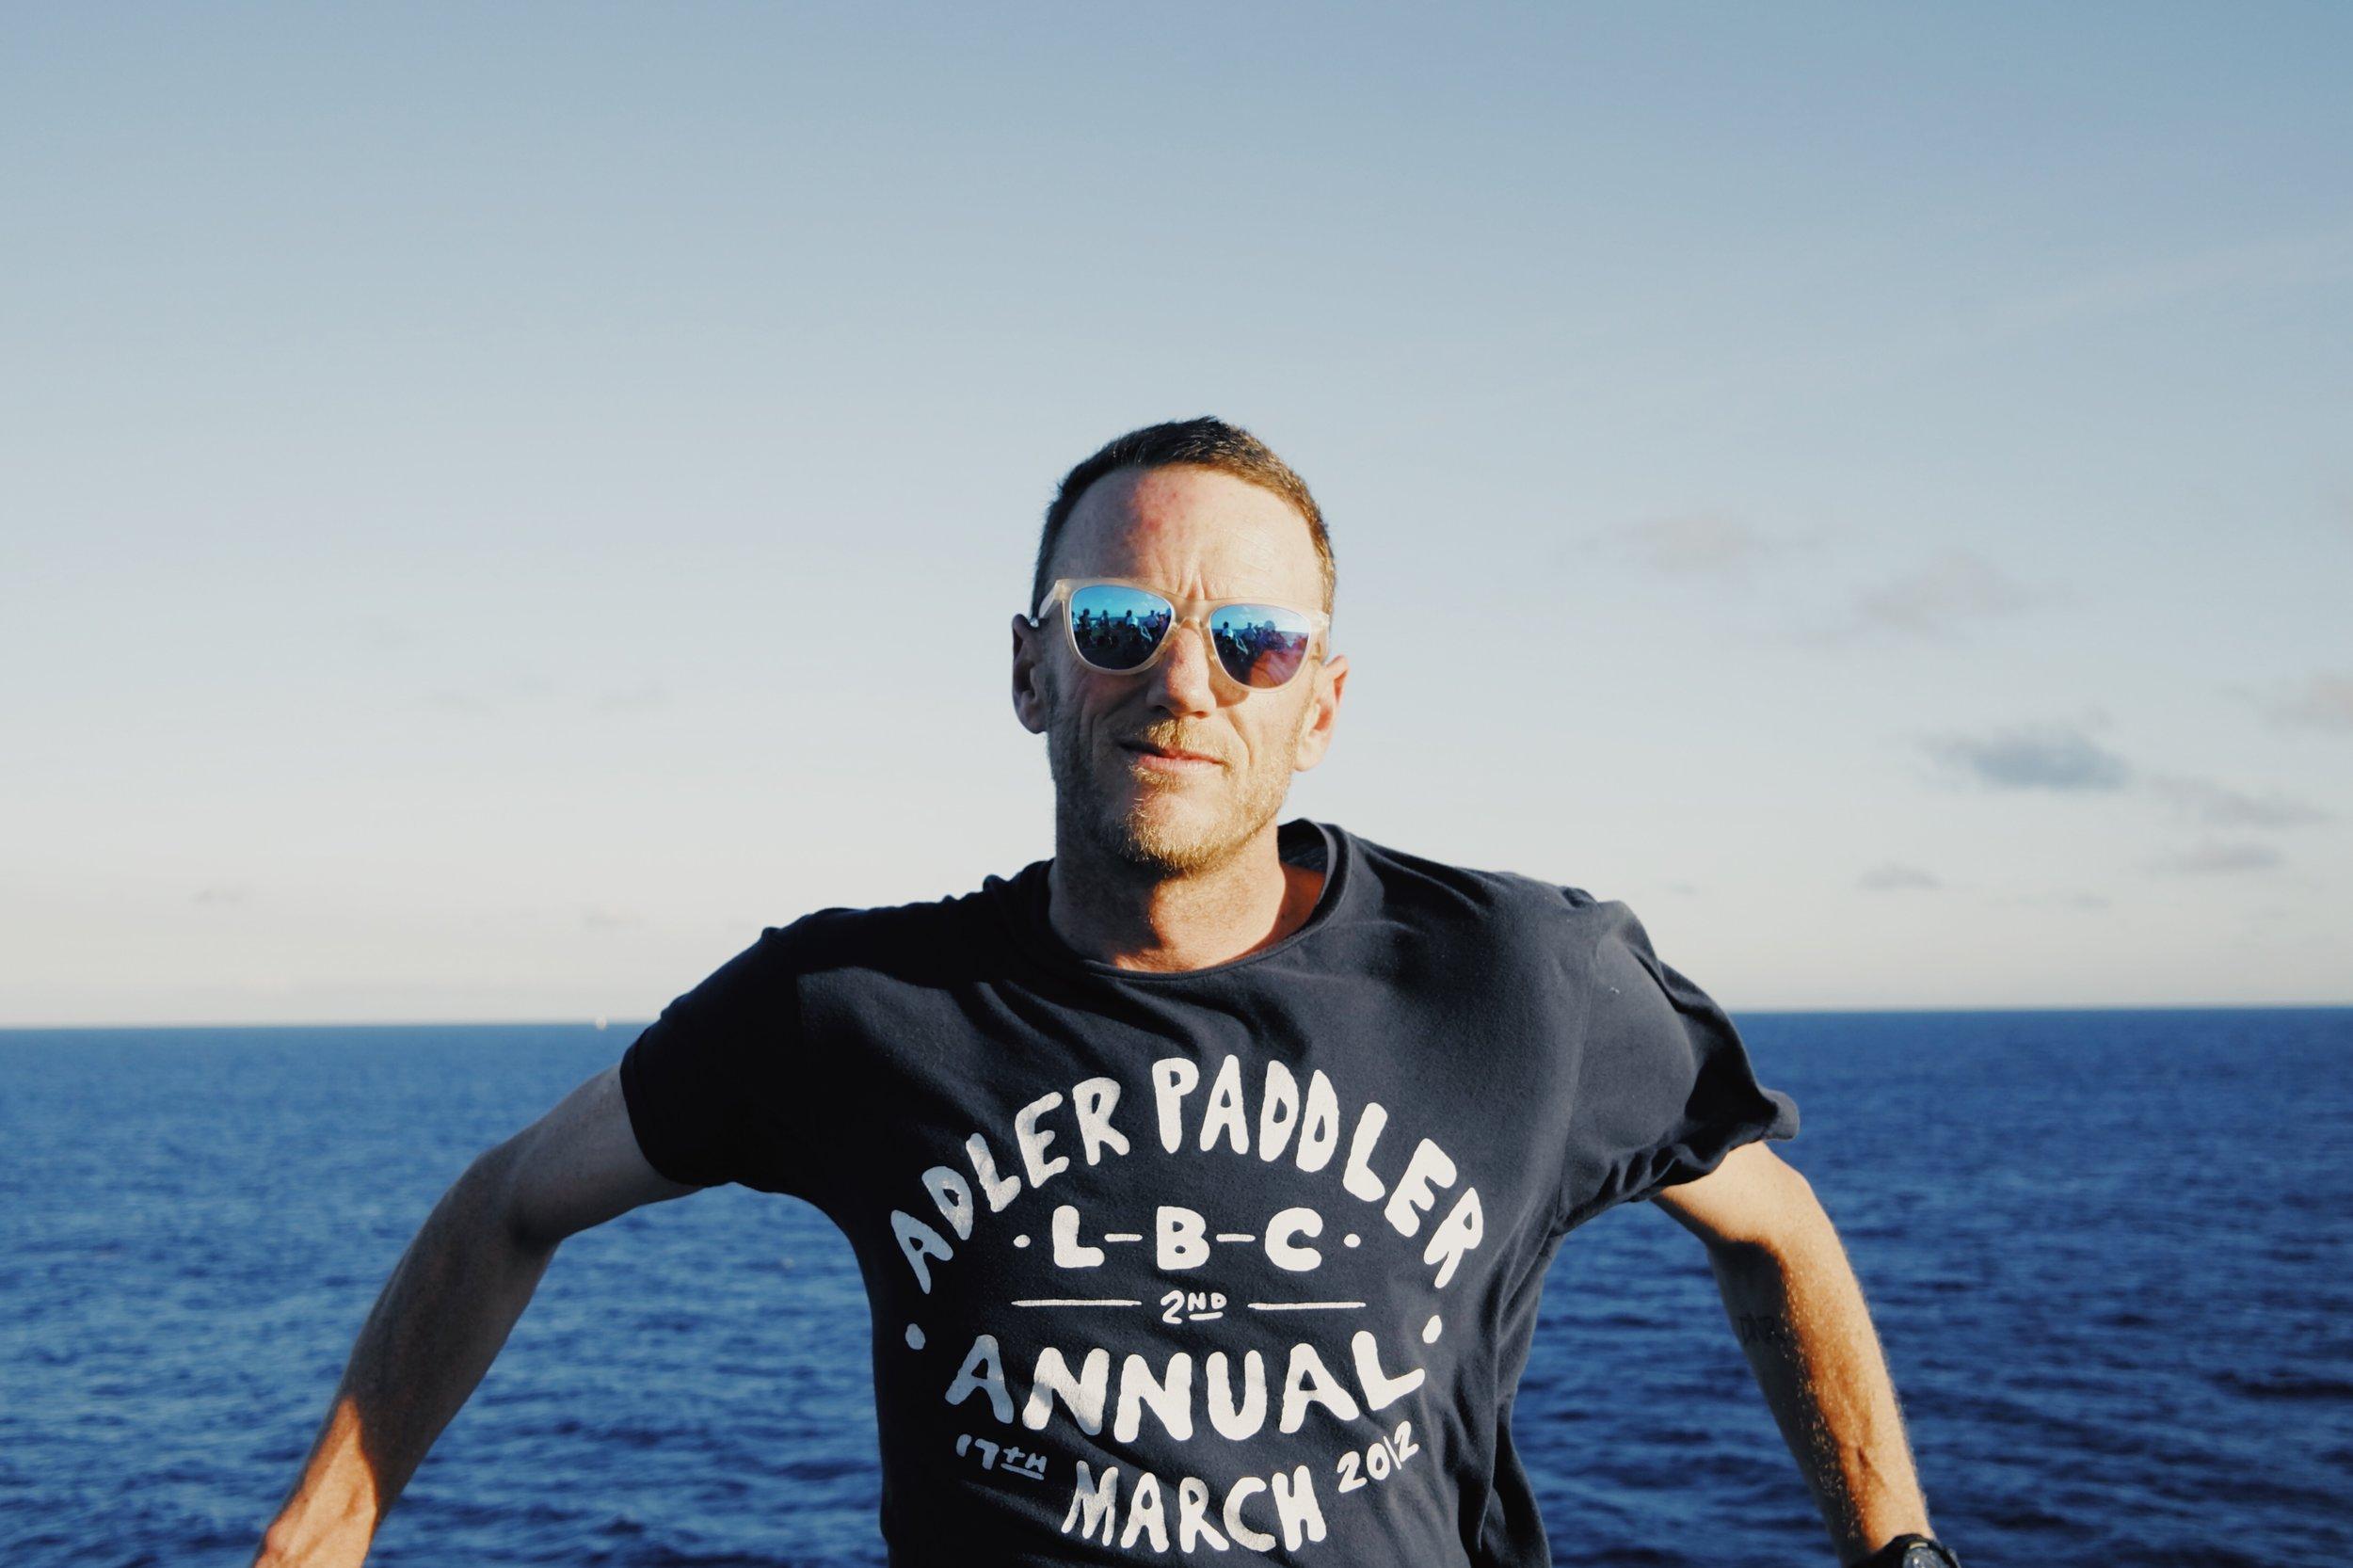 Joseph Dugan - Executive Producer & Founder